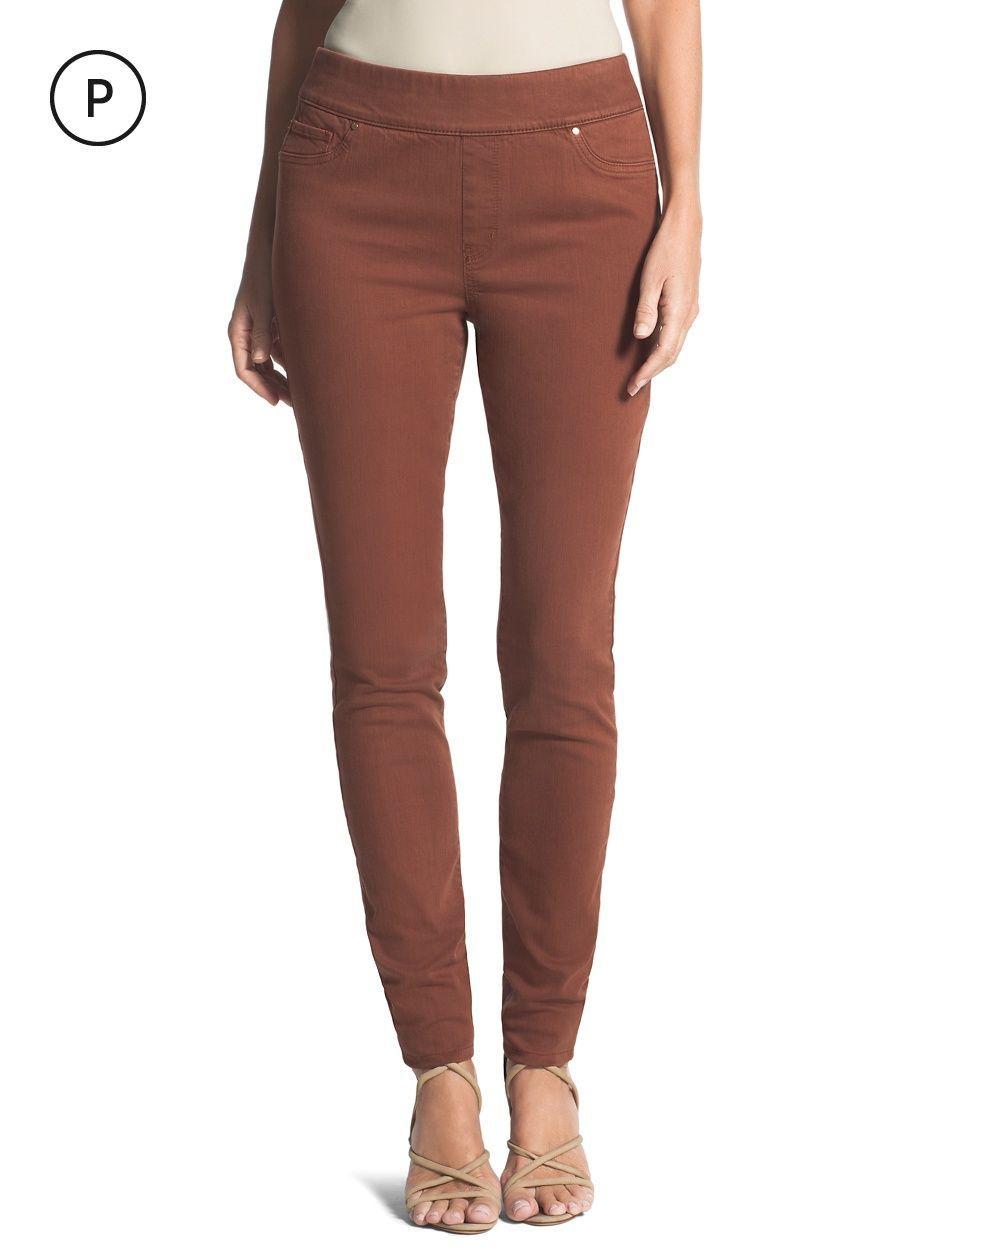 76fcb72153ca0 Chico's Women's So Perfect Petite Leggings | Products | Leggings ...